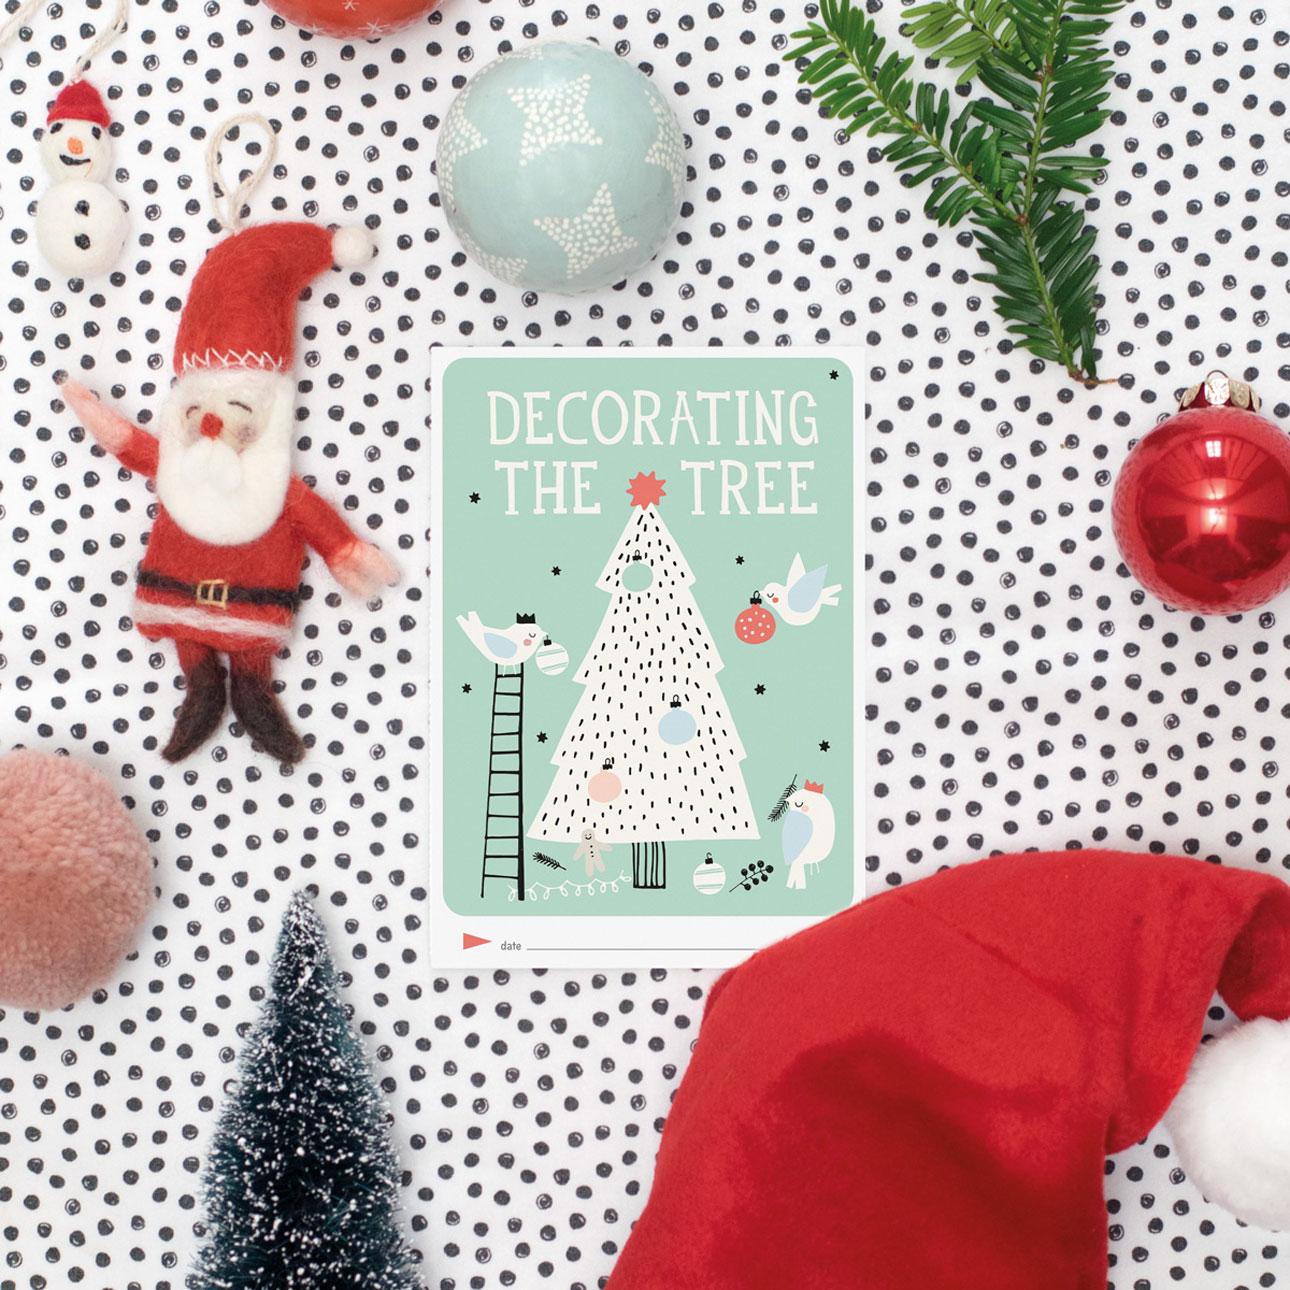 milestone baby's eerste kerst decorating the tree